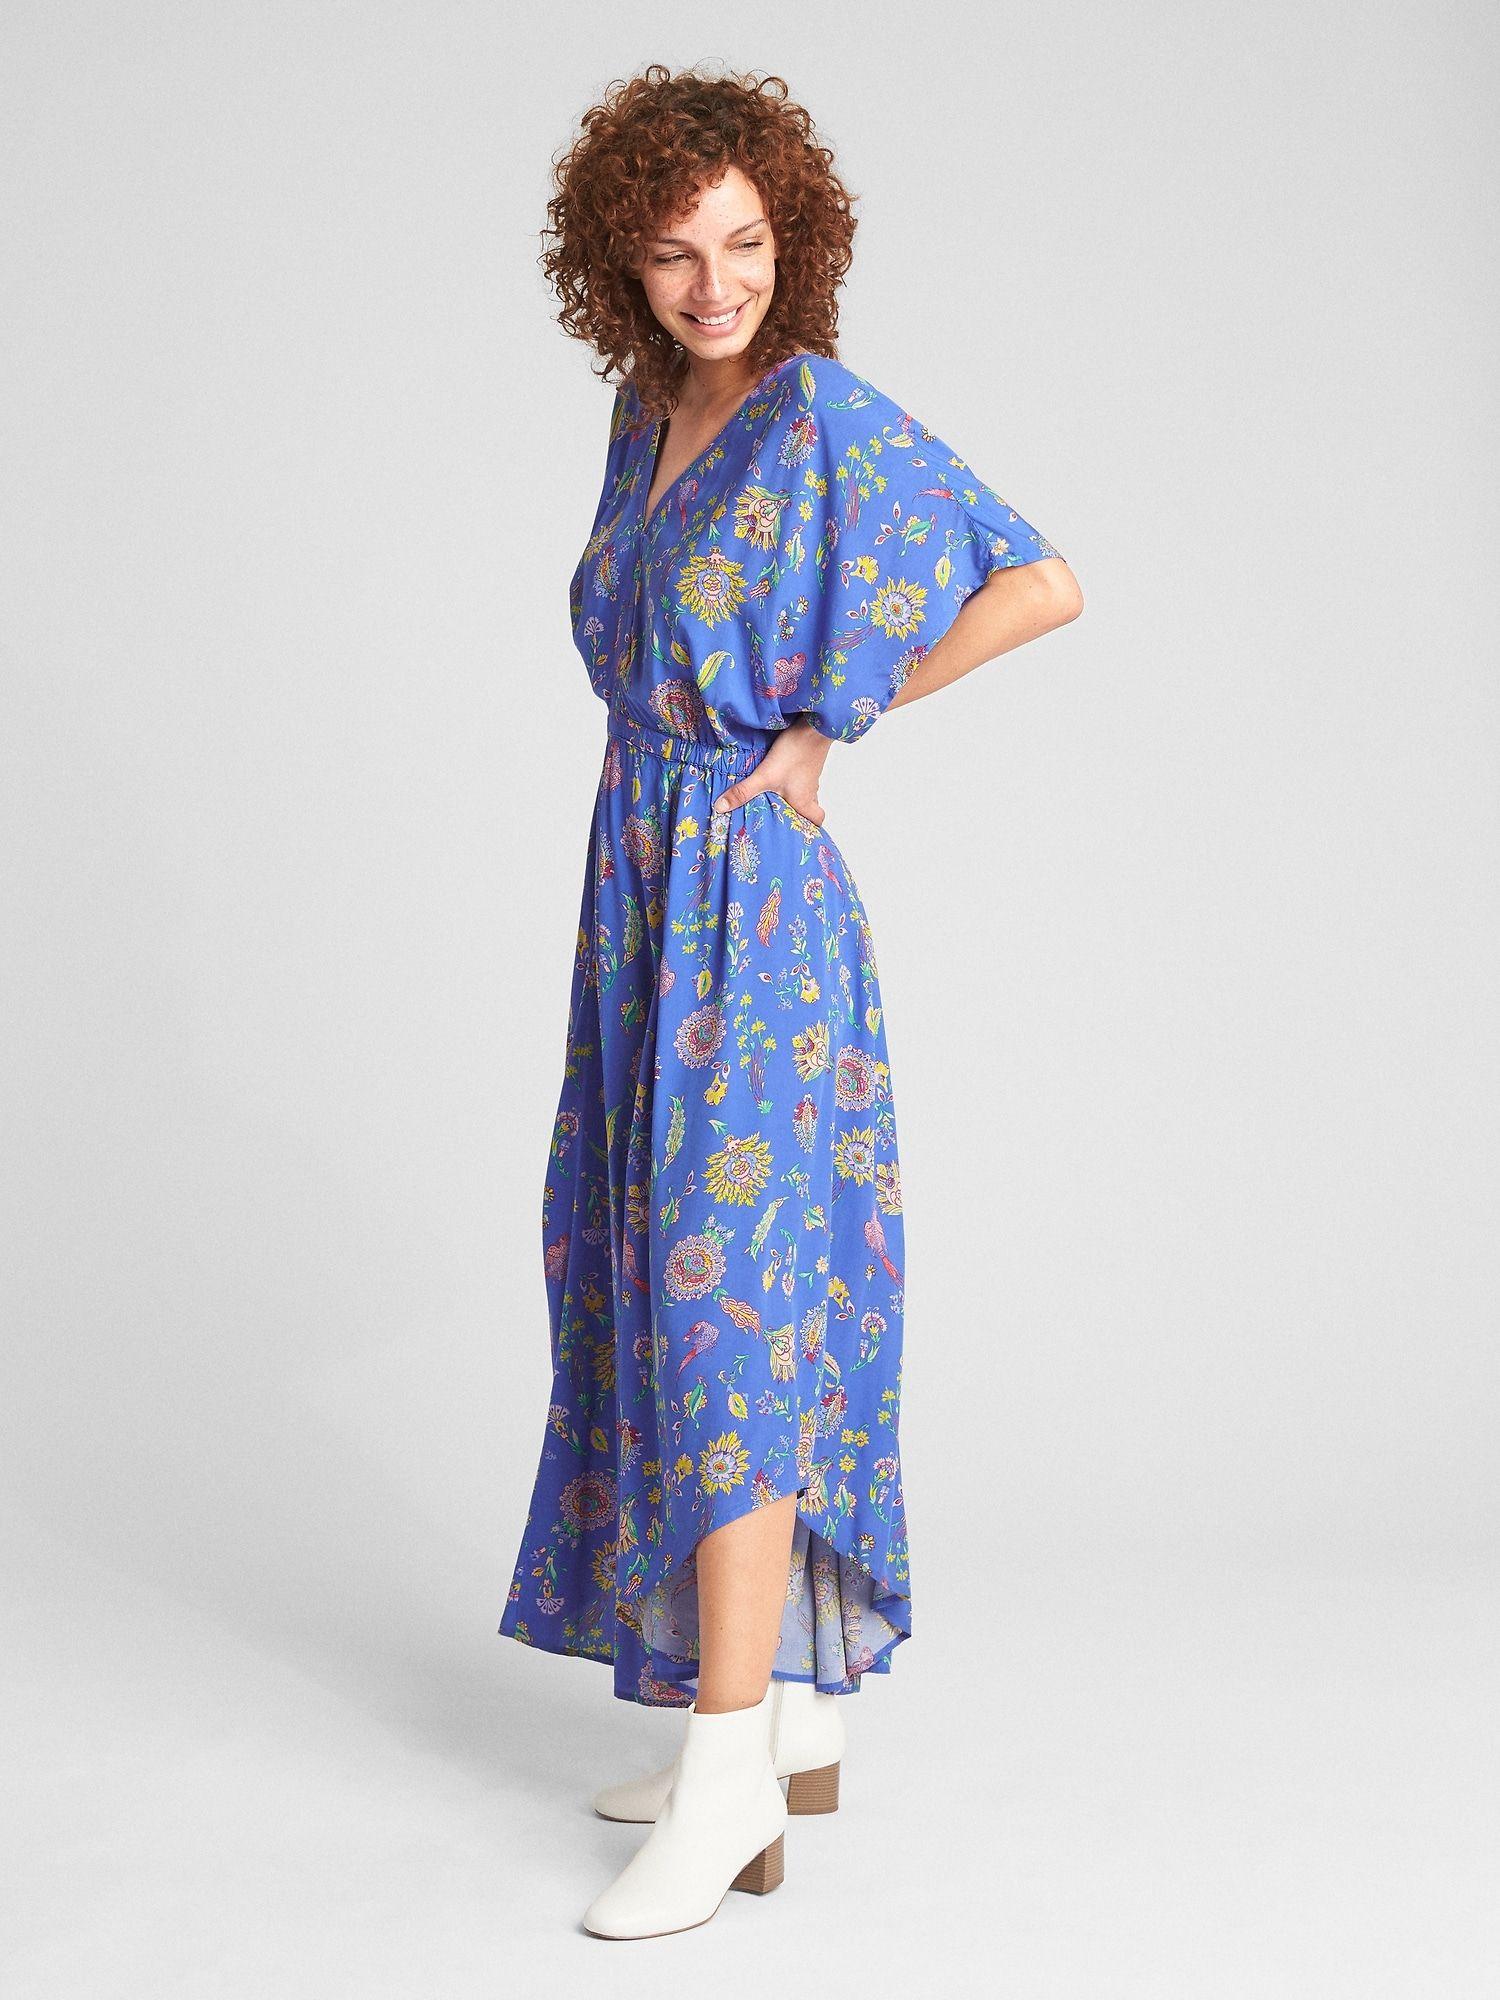 Kimono Sleeve Maxi Dress Gap Summer Maxi Dress Maxi Dress Blue Maxi Dress [ 2000 x 1500 Pixel ]